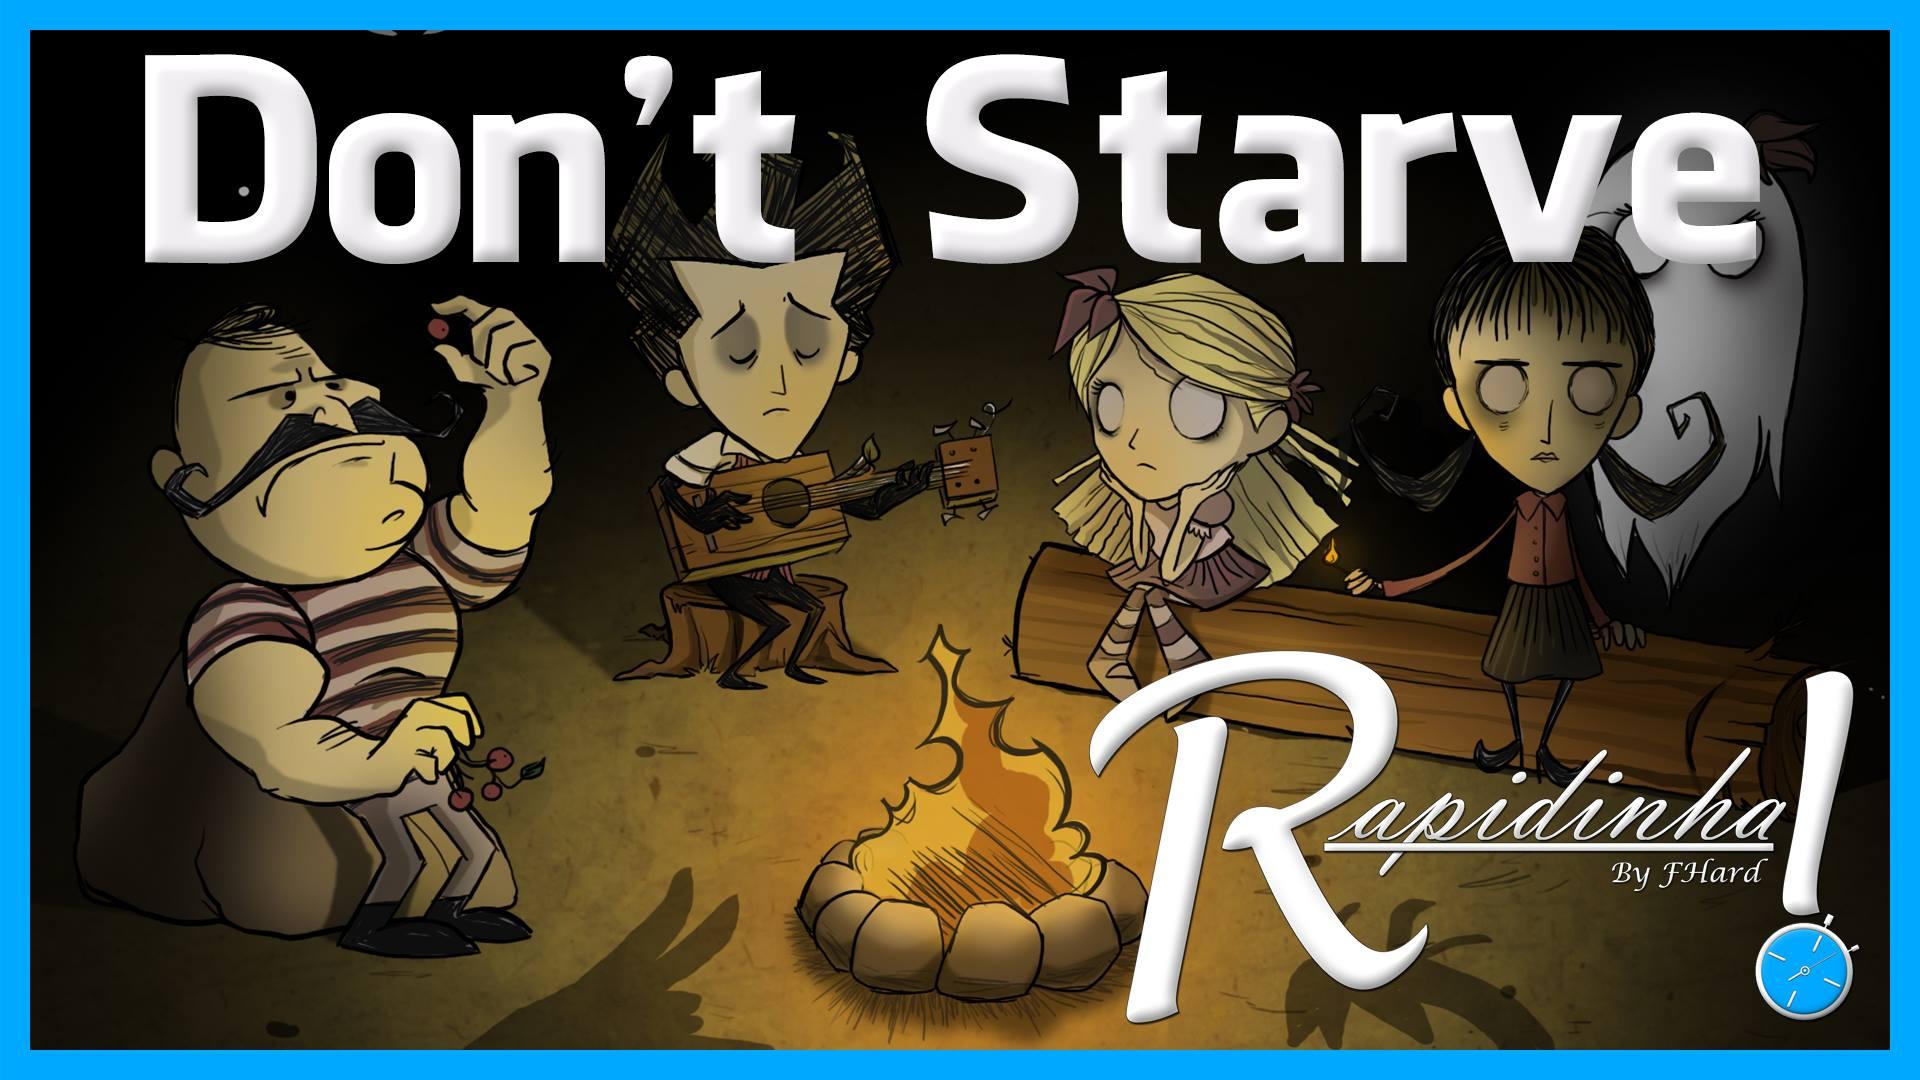 Don't Starve - FHard - Imagem